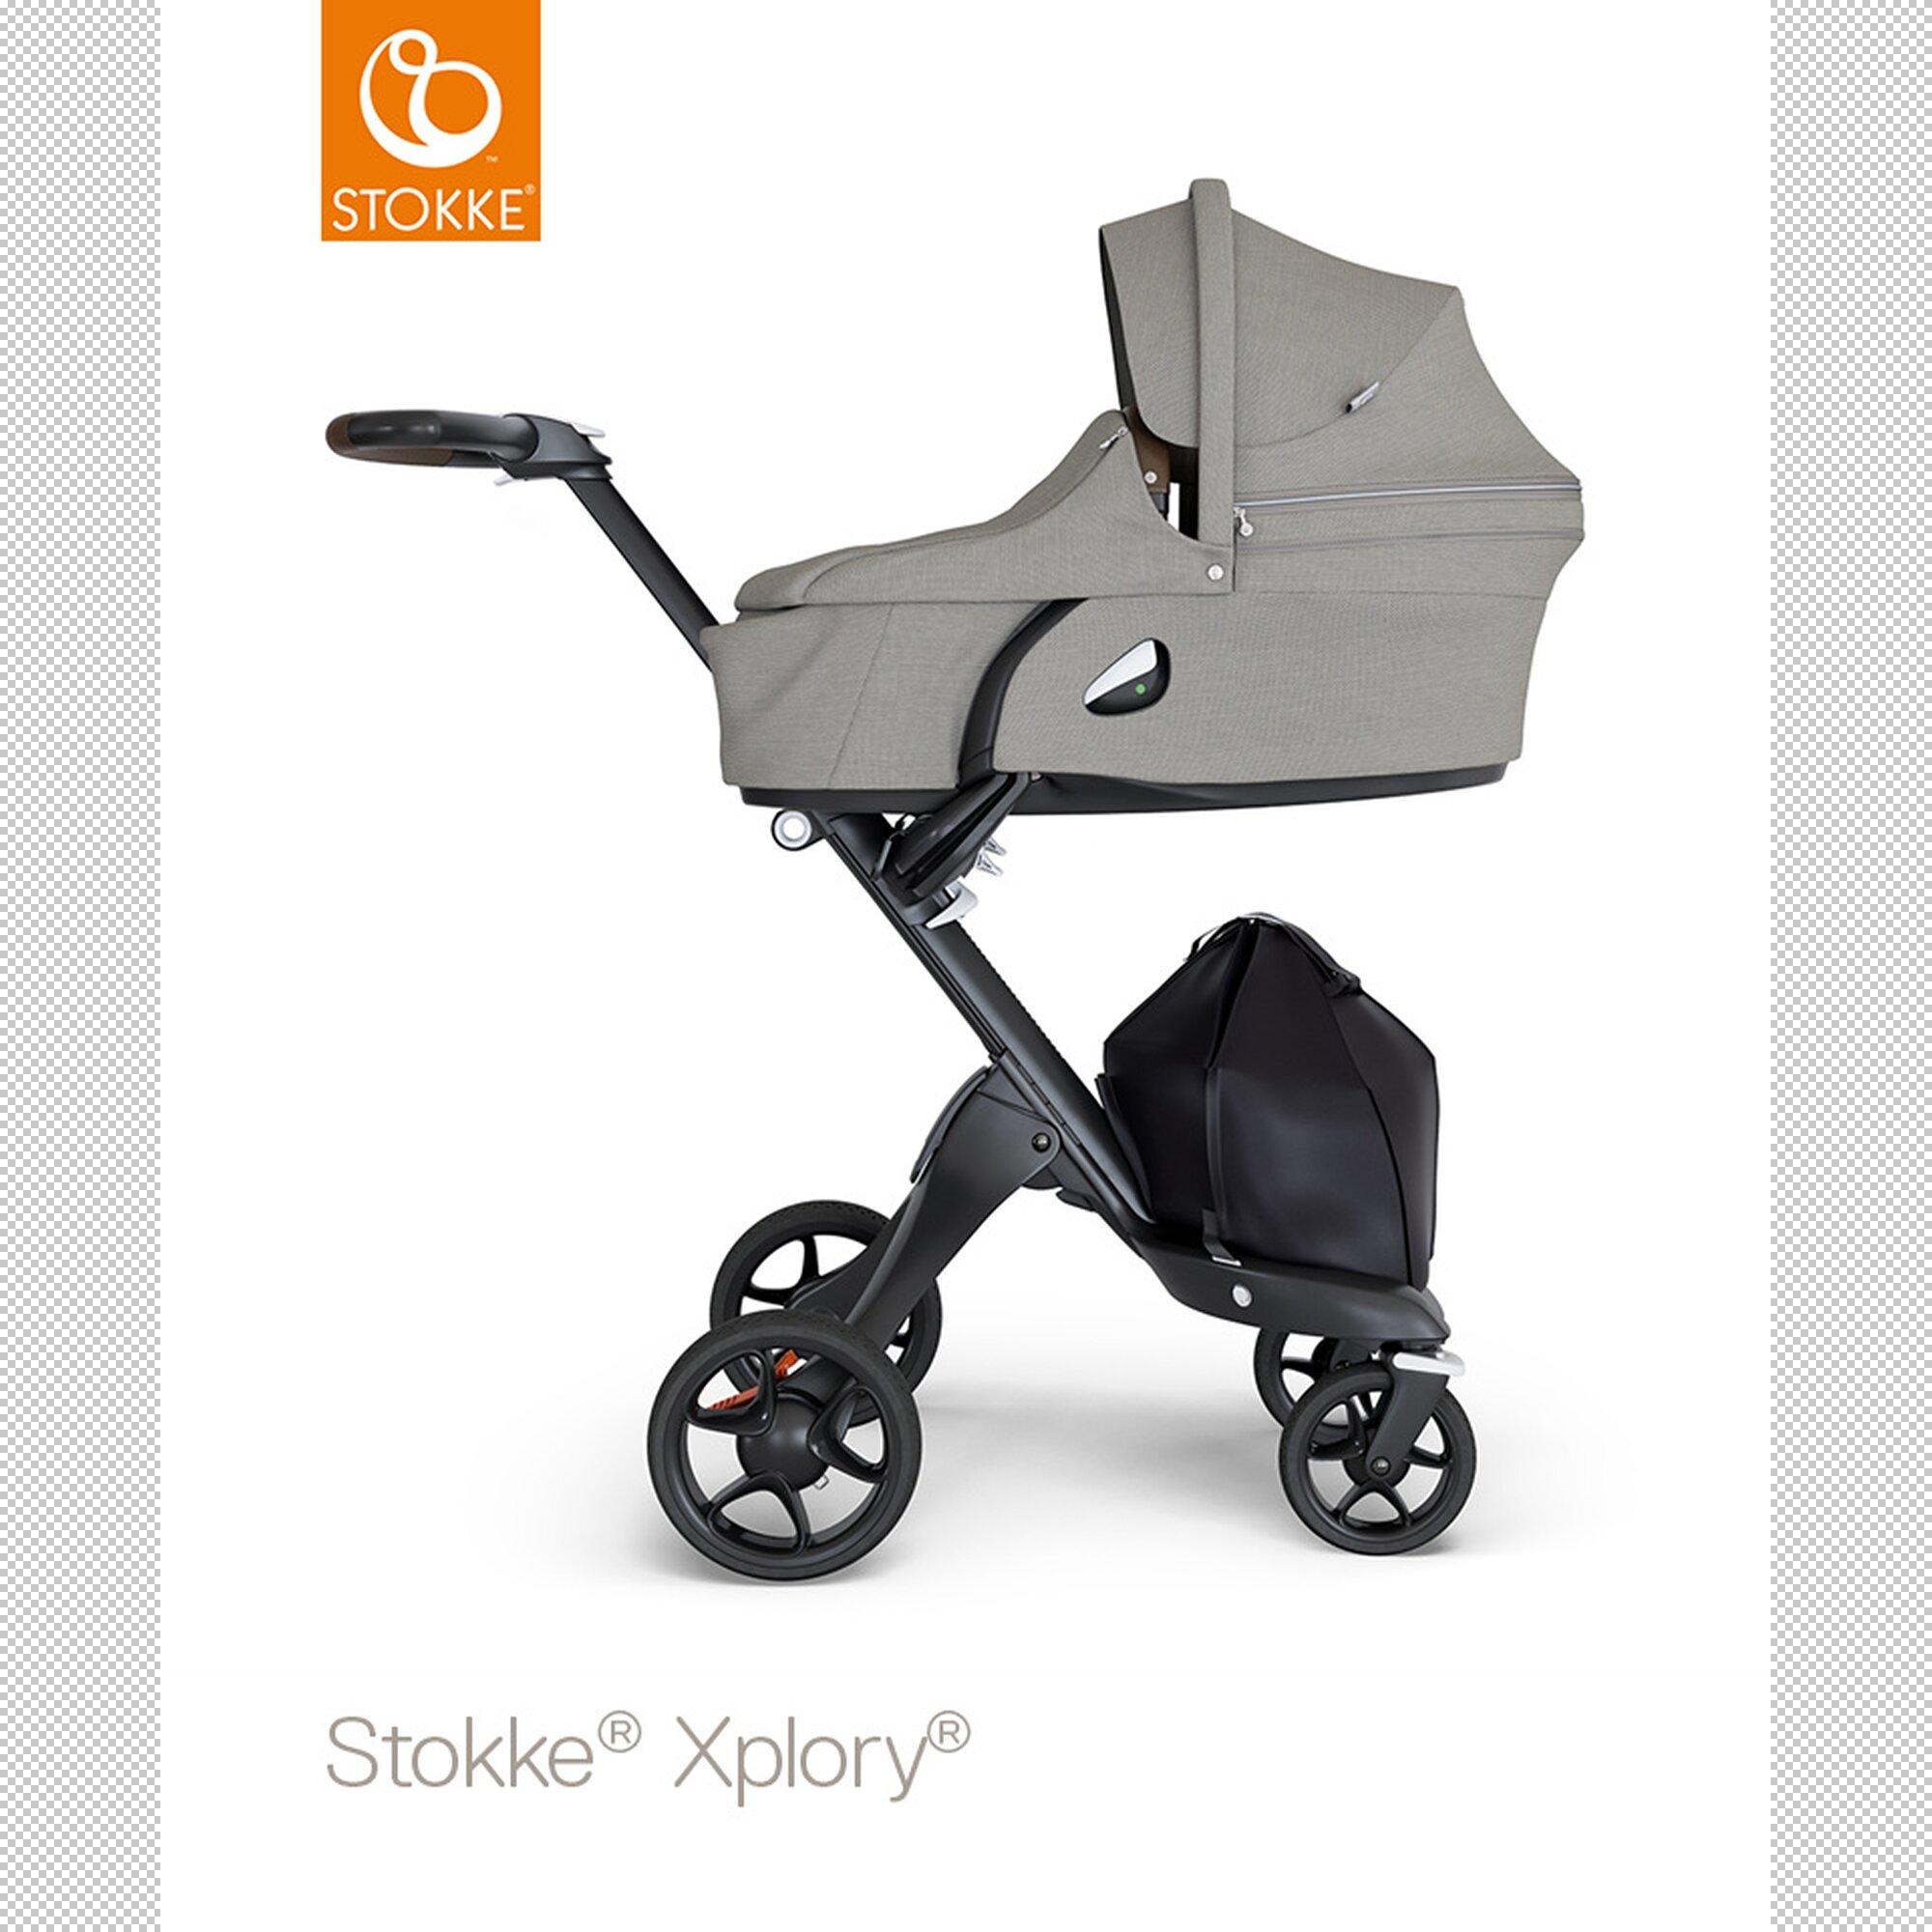 stokke-tragewanne-xplory-v6